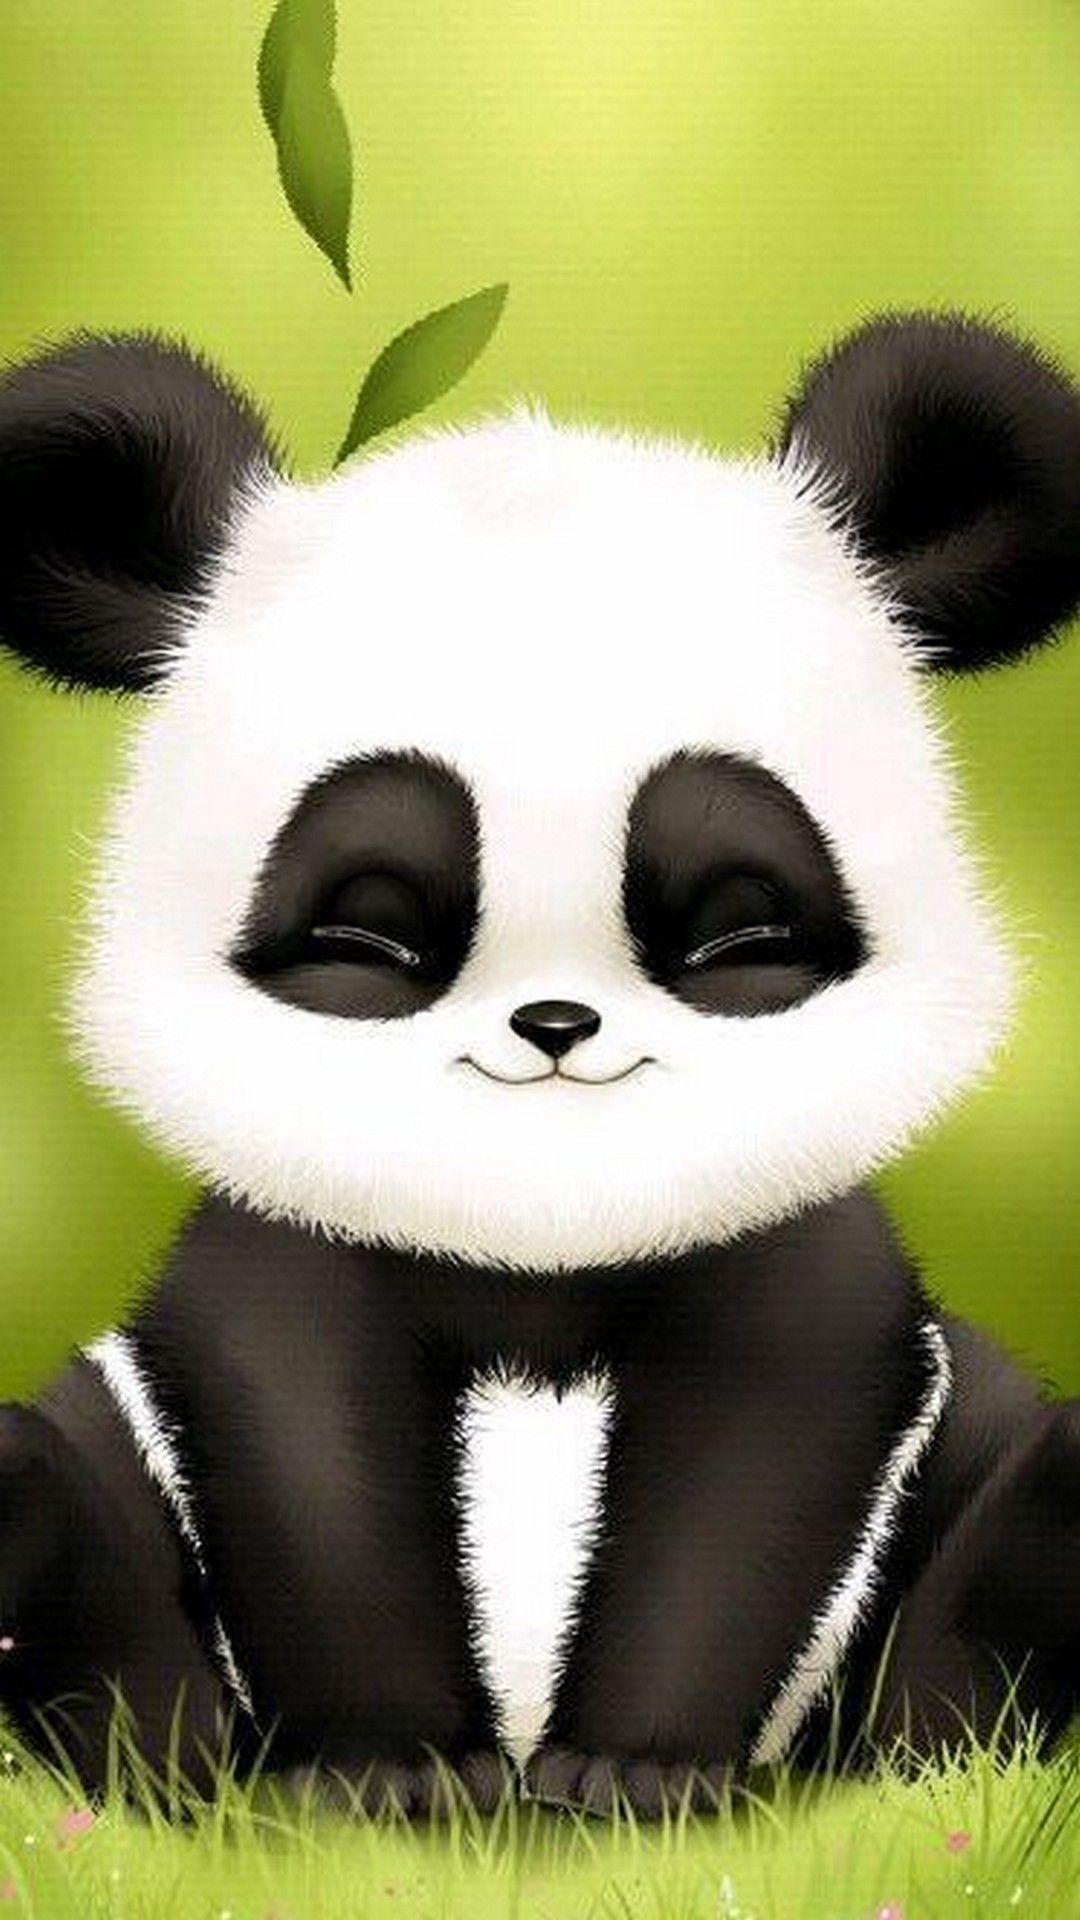 Animation panda wallpapers wallpaper cave - Baby animation wallpaper ...